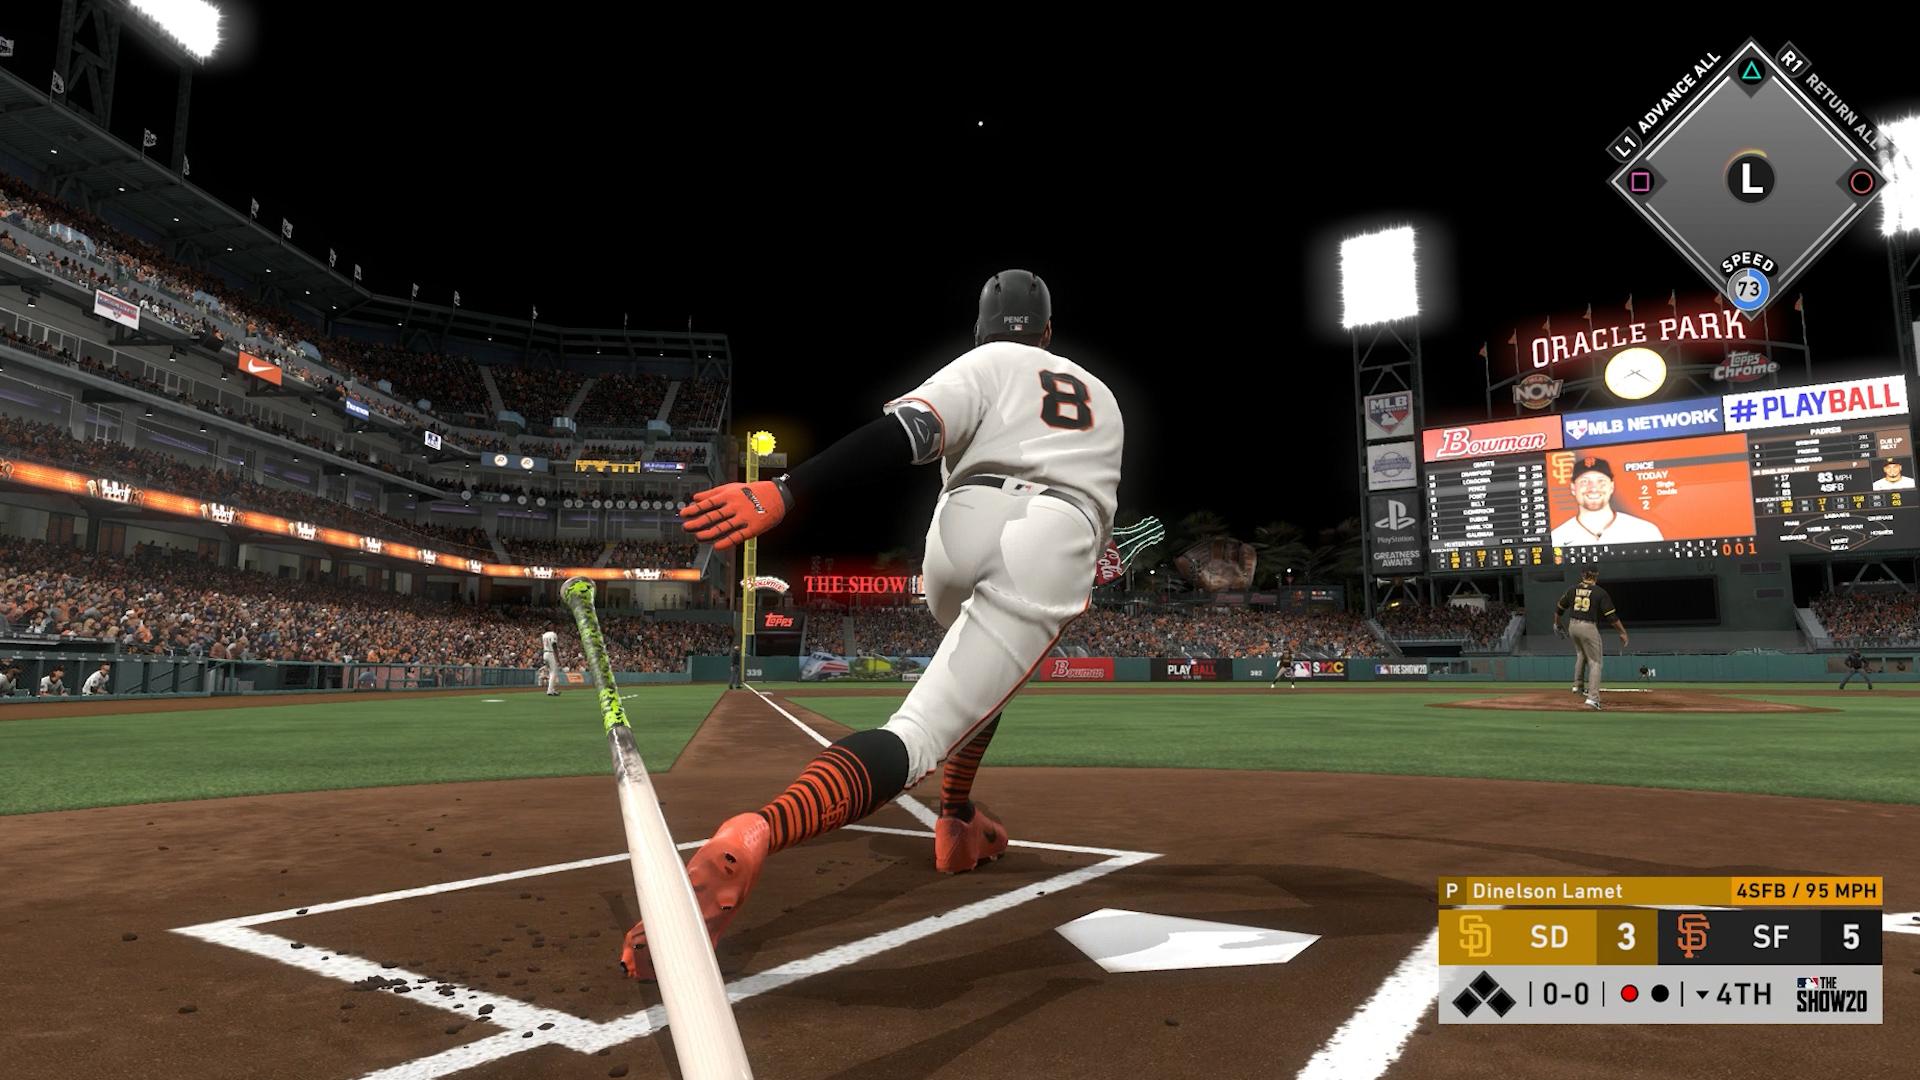 giants home run swings